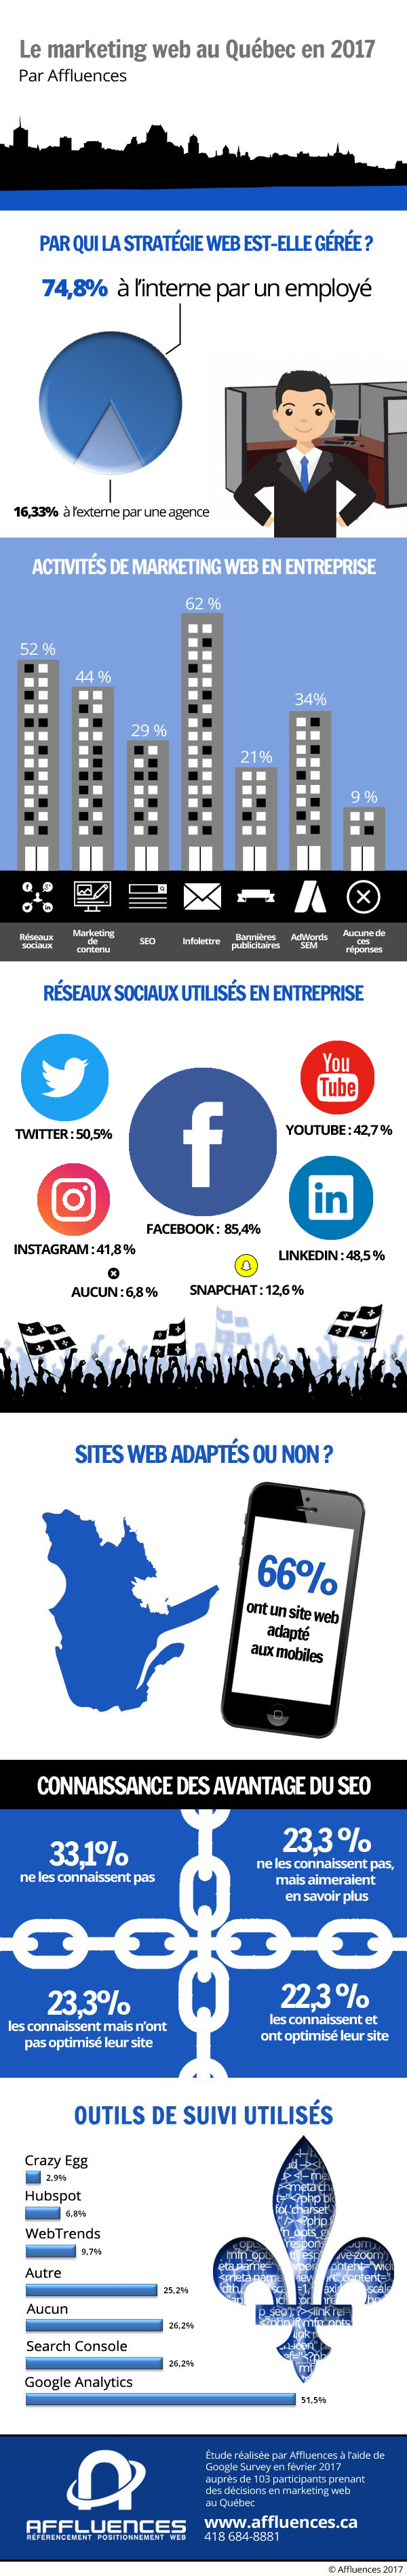 infographie-marketing-web-québec-2017